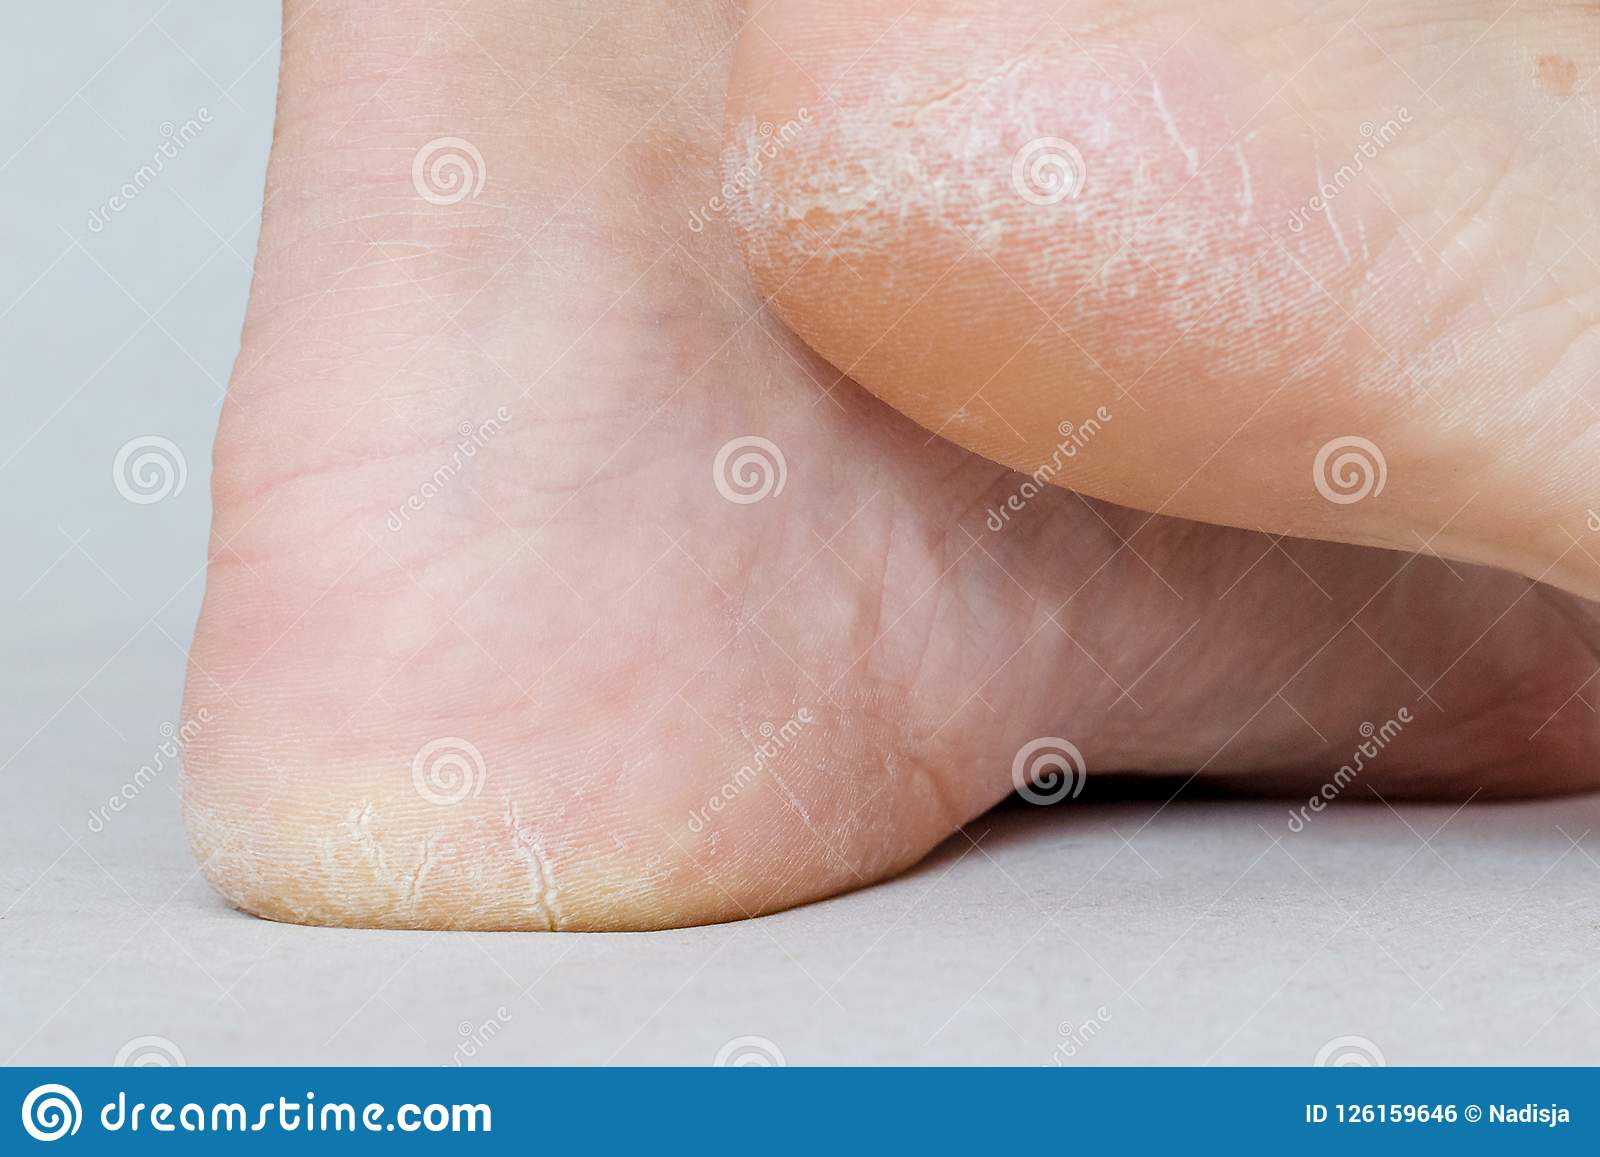 Female feet with dry heels, cracked skin